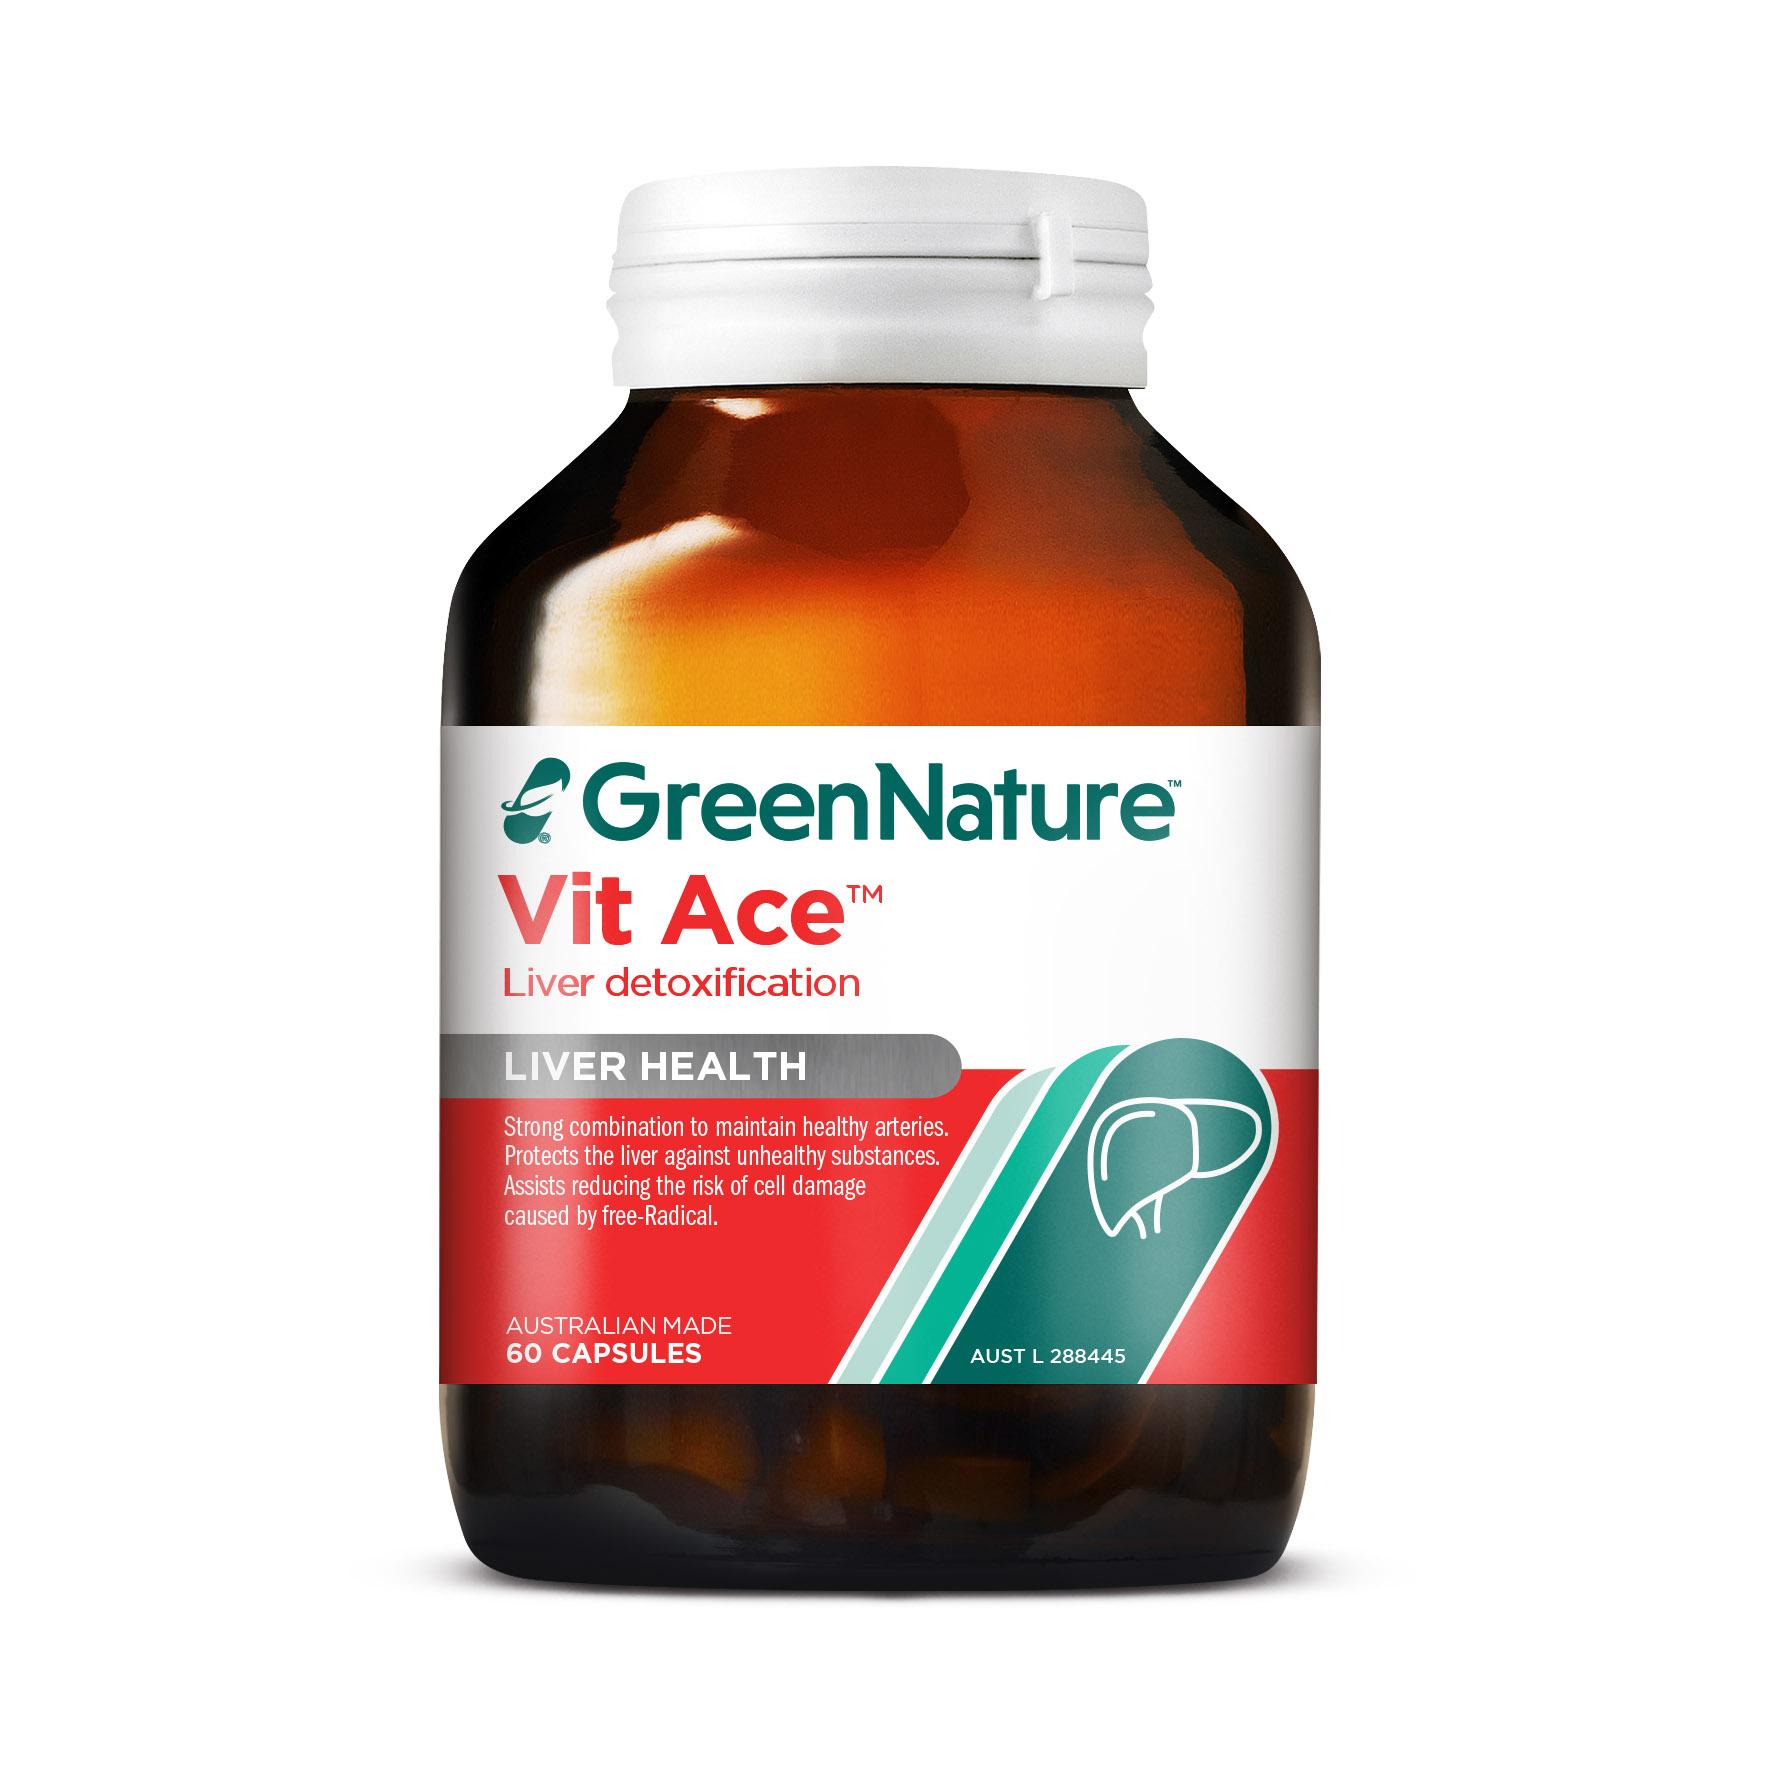 VitAce-greennature